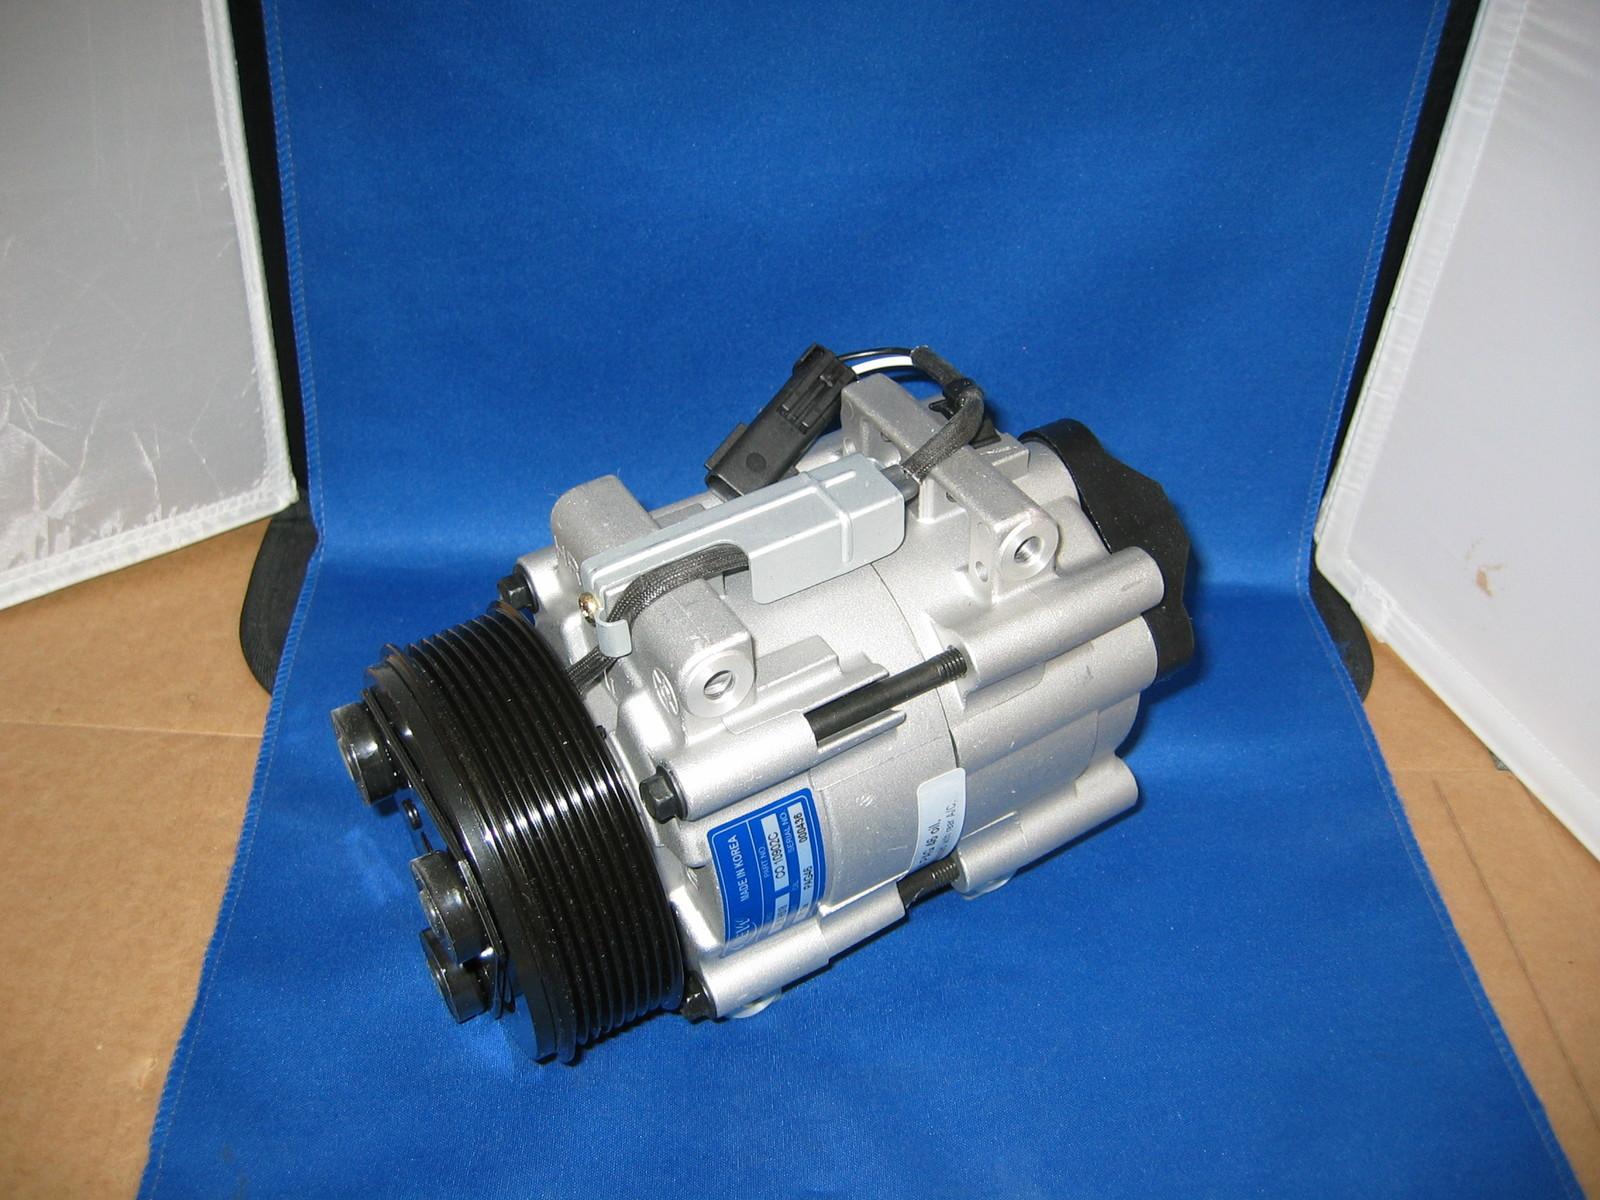 06-08 Dodge Ram 3500 5.9 Pickup AC Air Conditioning Compressor Repair Part Kit